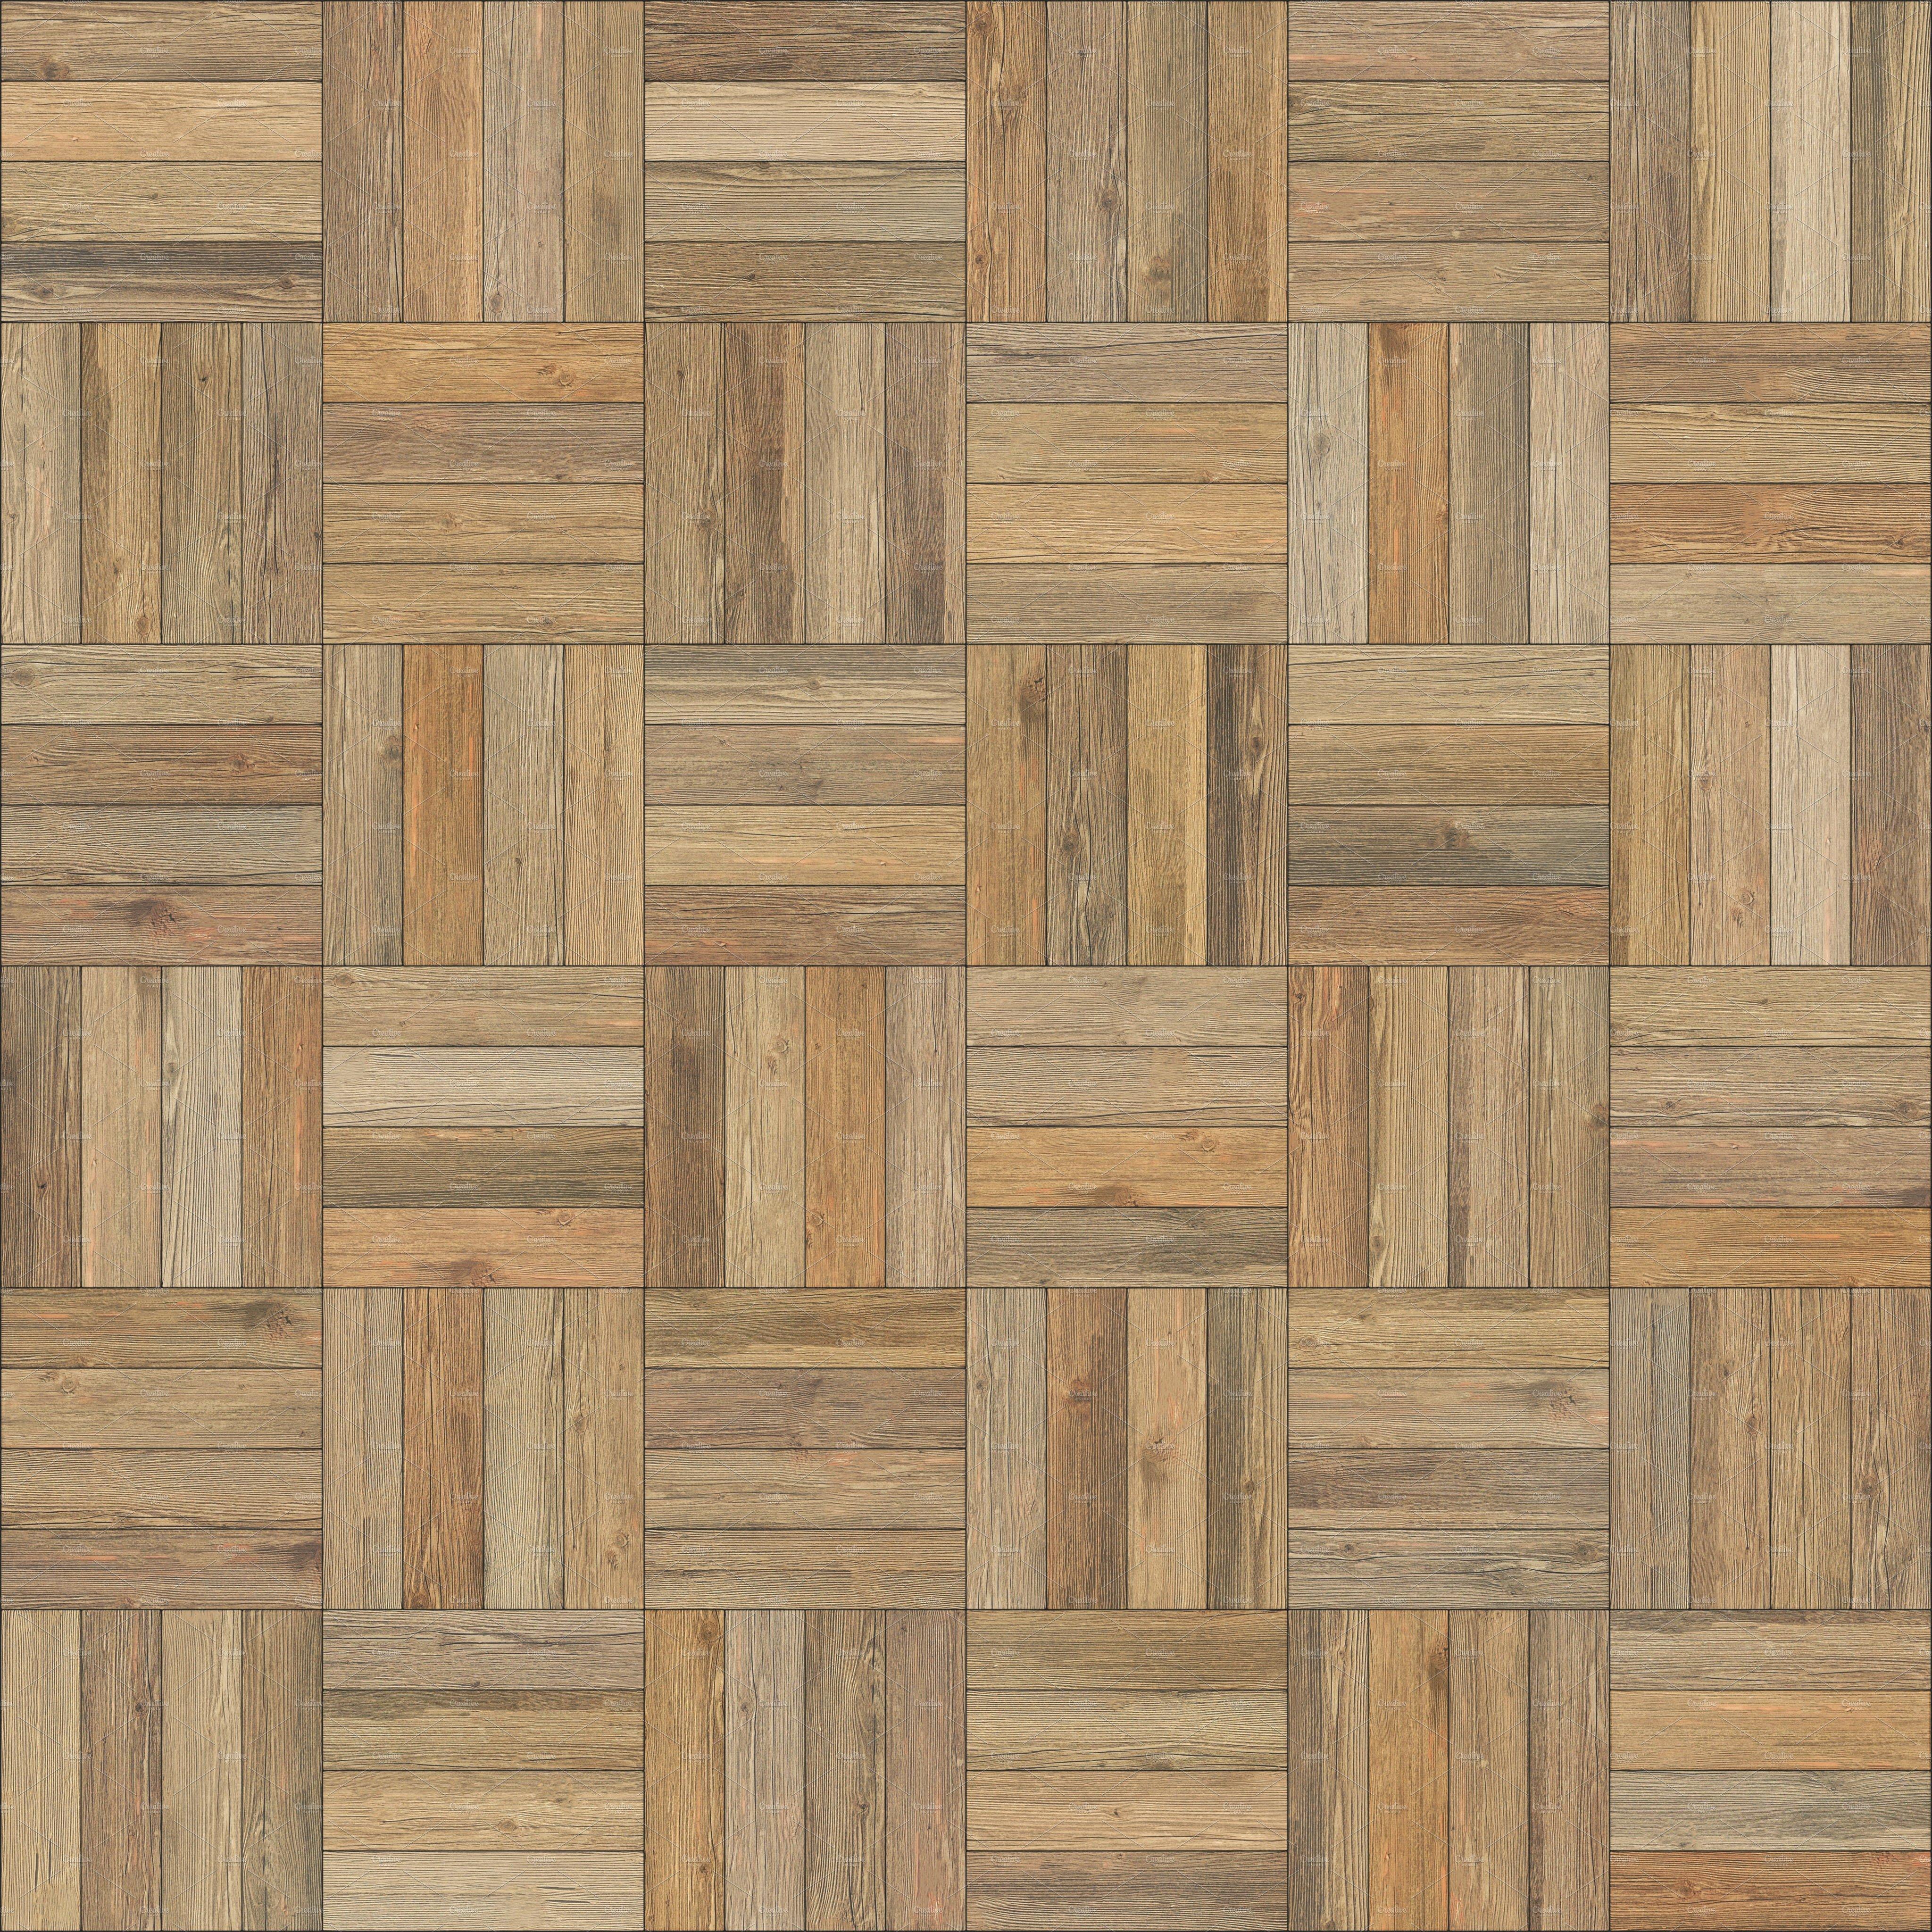 Seamless wood parquet texture ~ Textures ~ Creative Market